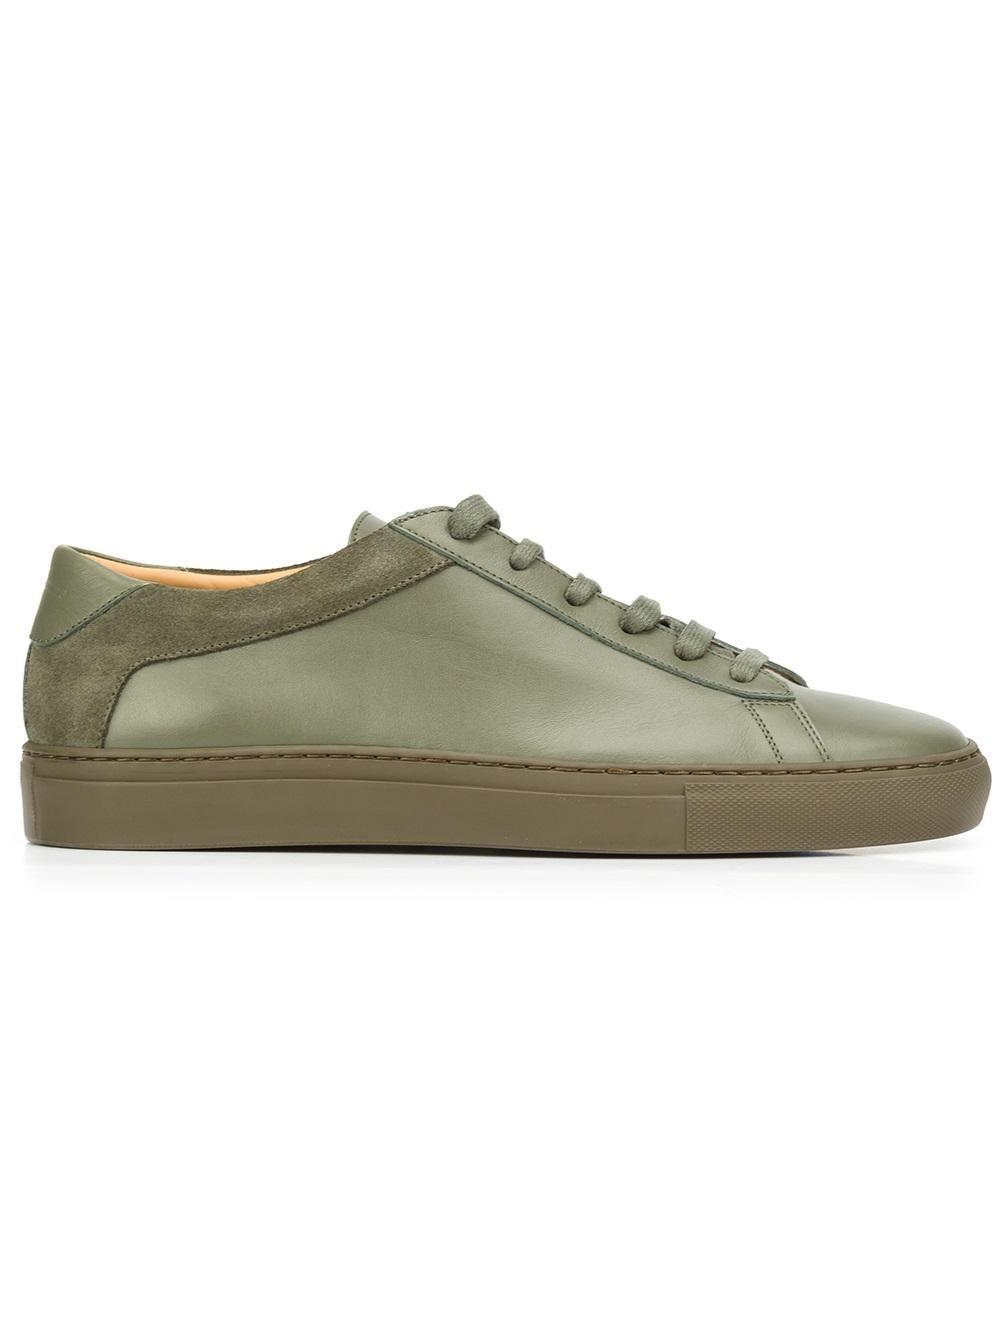 Koio Collective 'Capri Oliva' sneakers